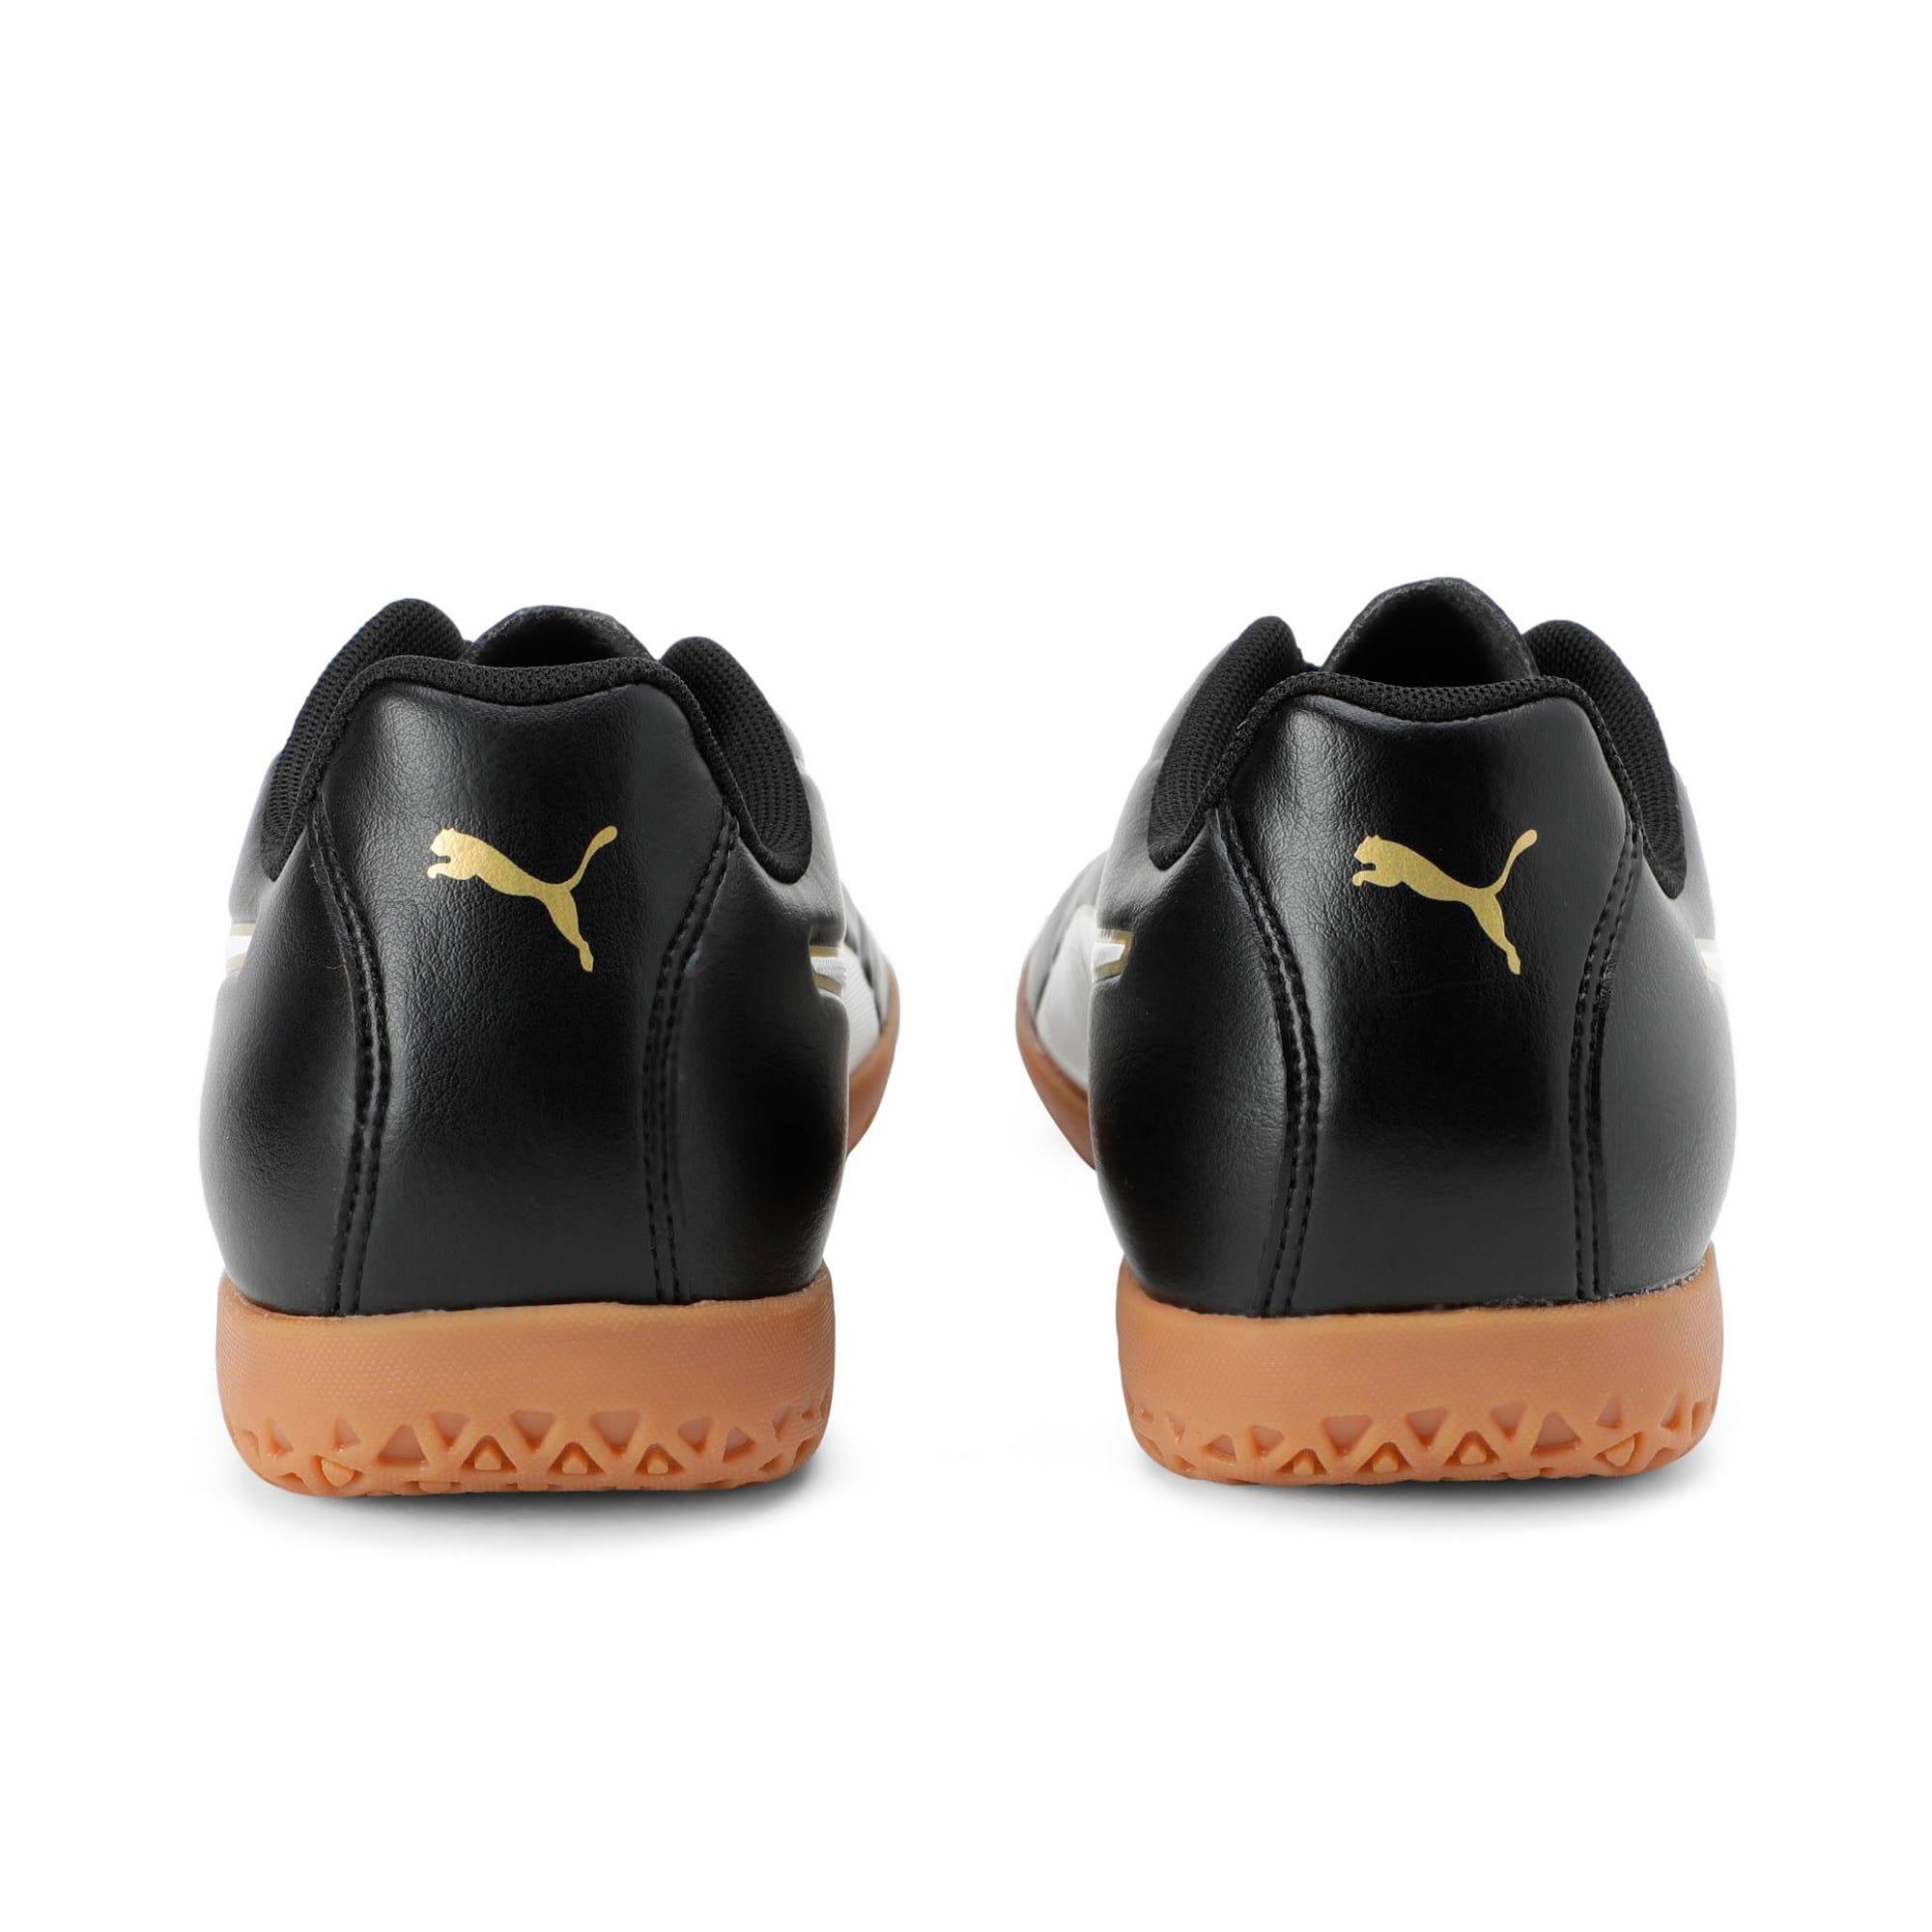 Thumbnail 2 of Classico C II Men's Football Boots, Puma Black-Puma White-Gold, medium-IND